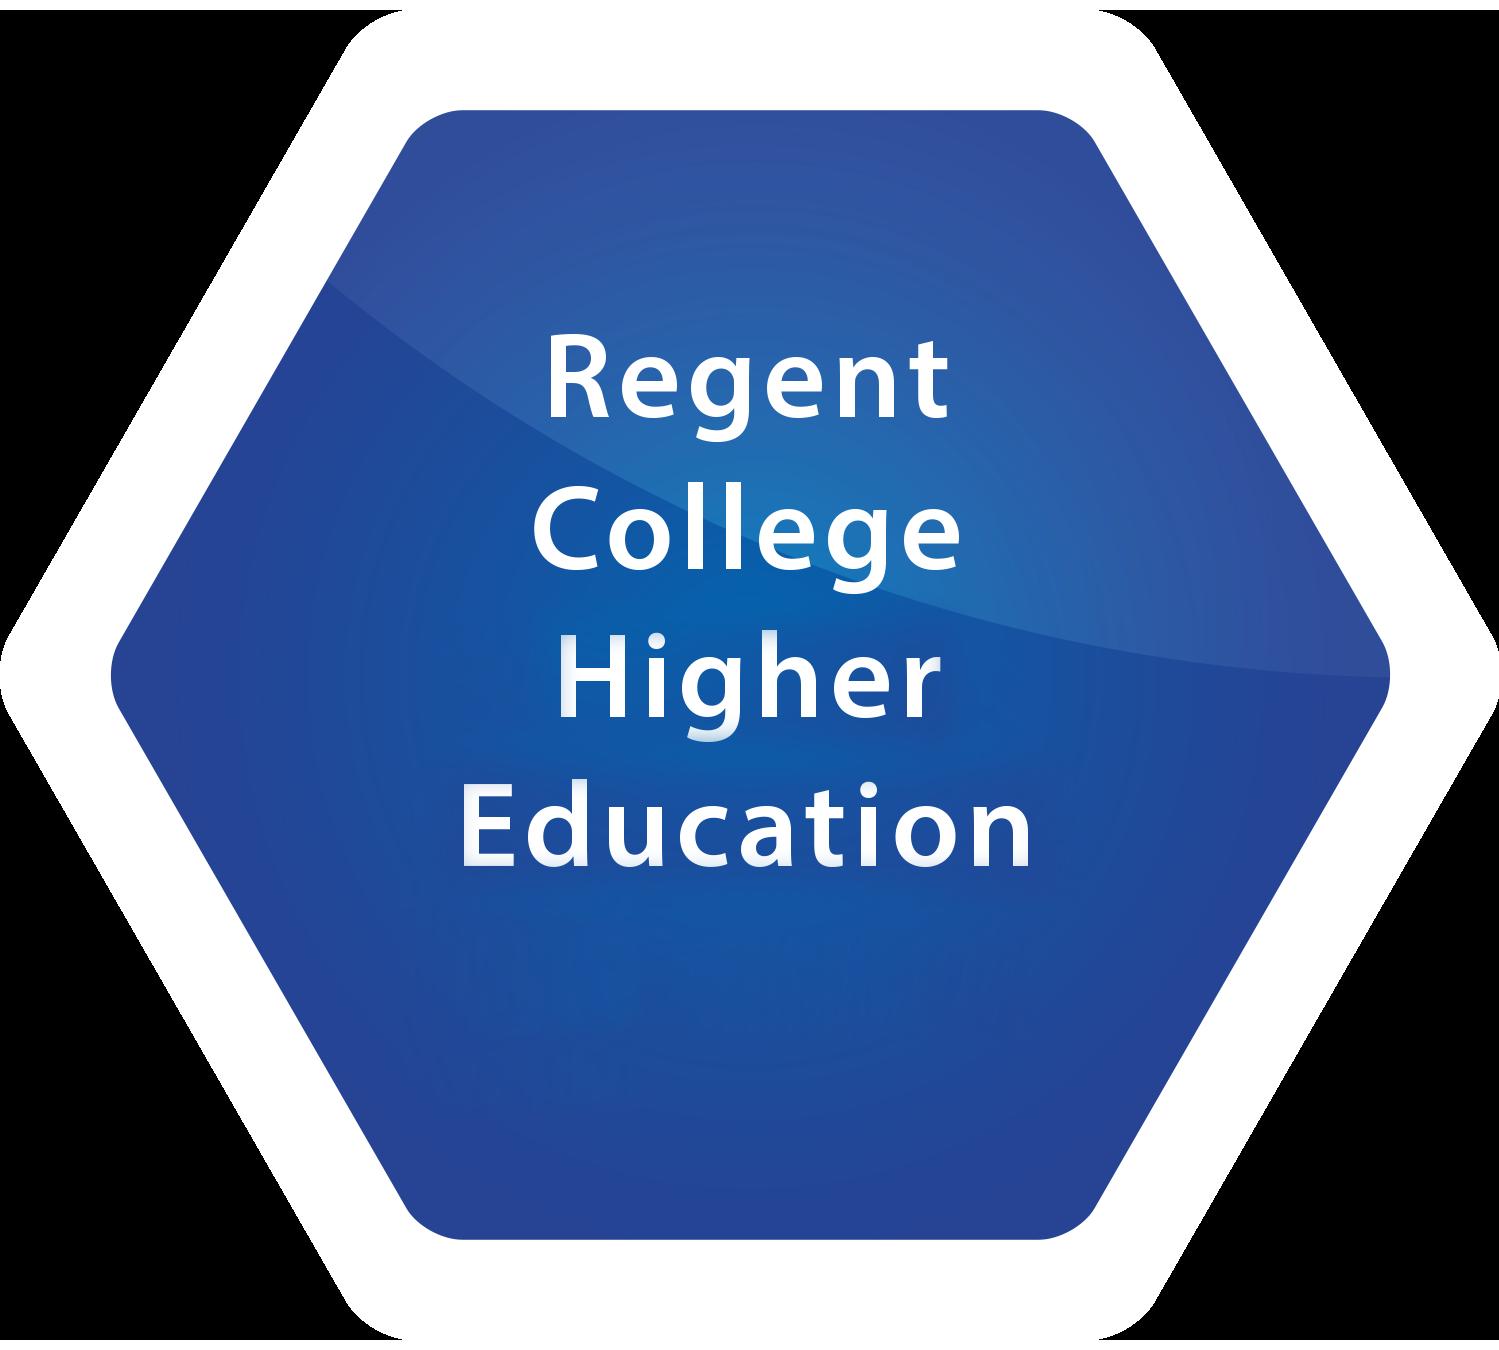 regent-college-higher-education